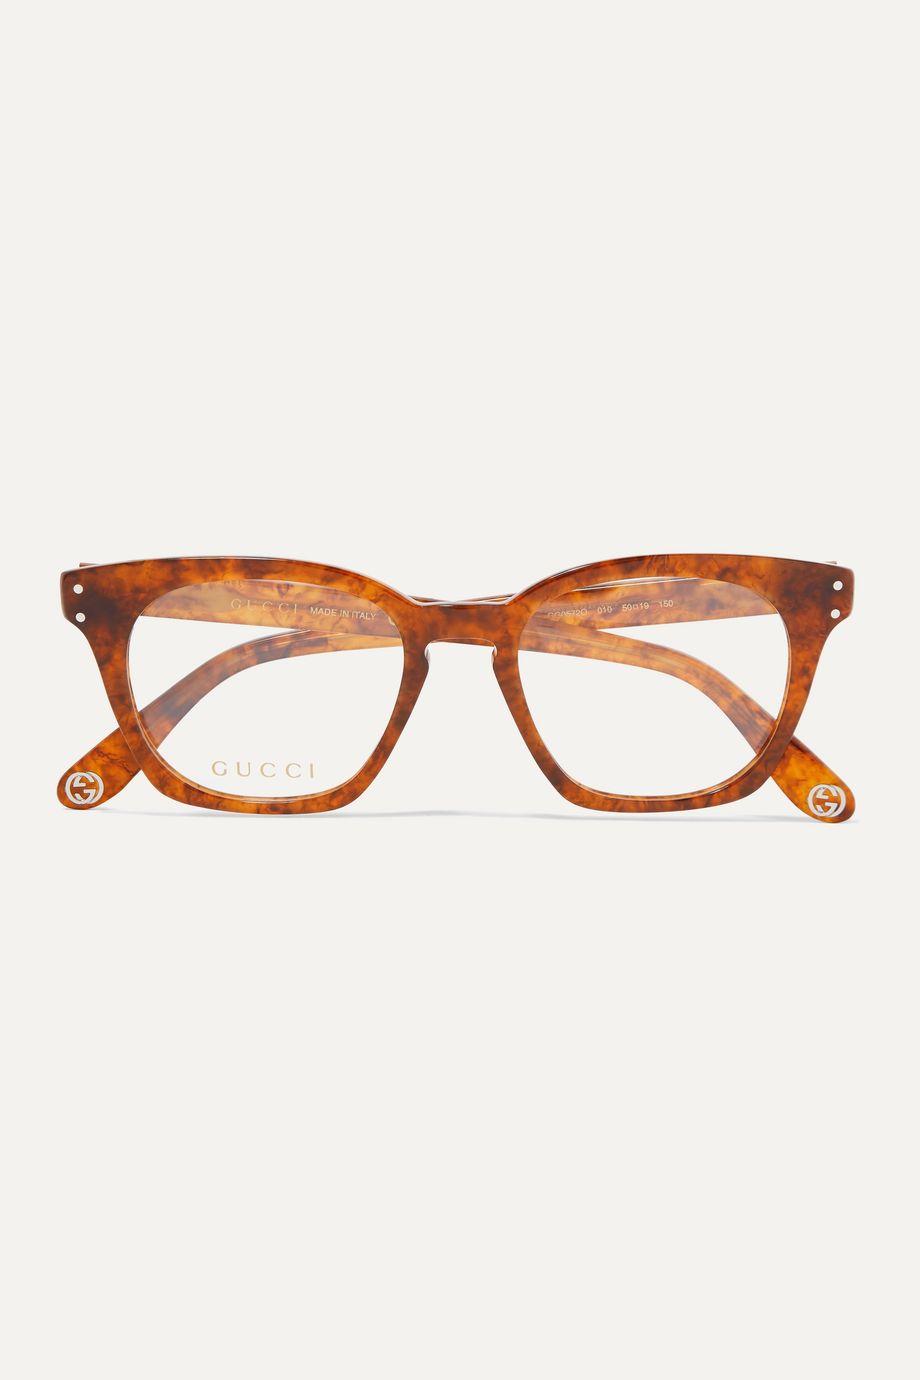 Gucci Square-frame tortoiseshell acetate optical glasses